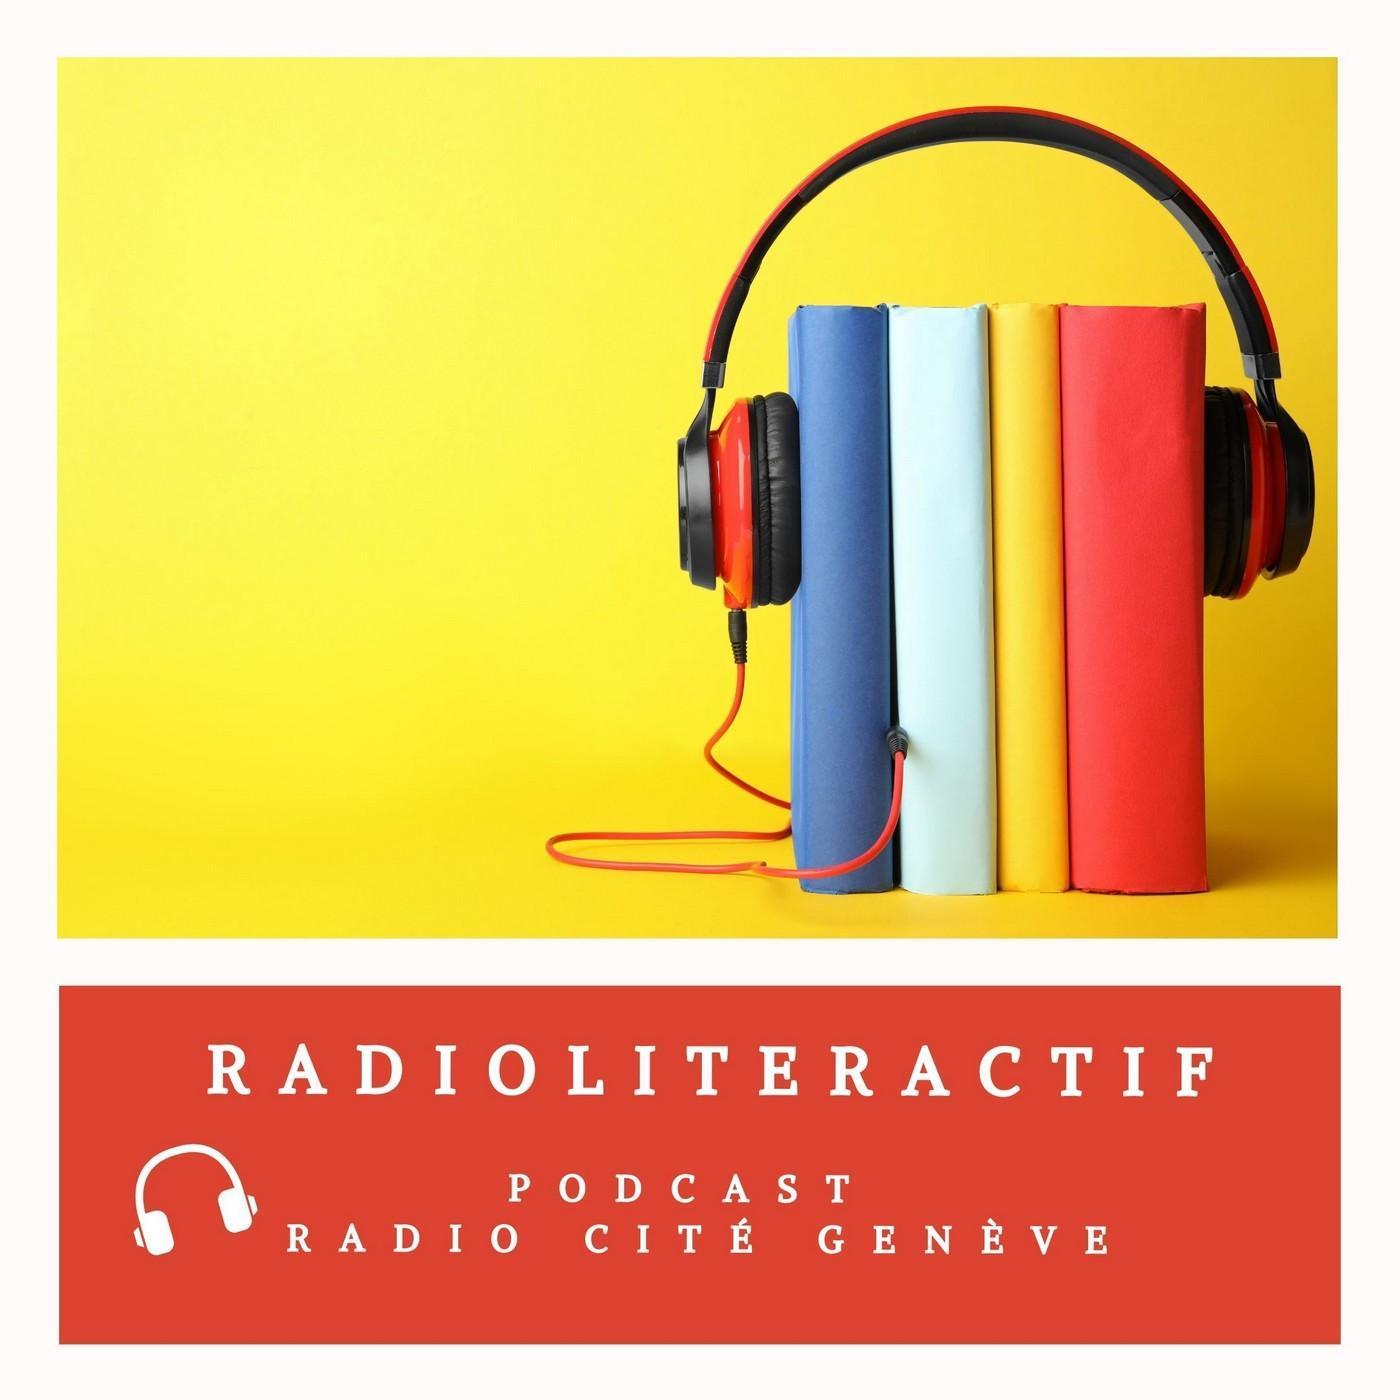 Radioliteractif du 26/07/2021 - Jean-Bernard Vuillème